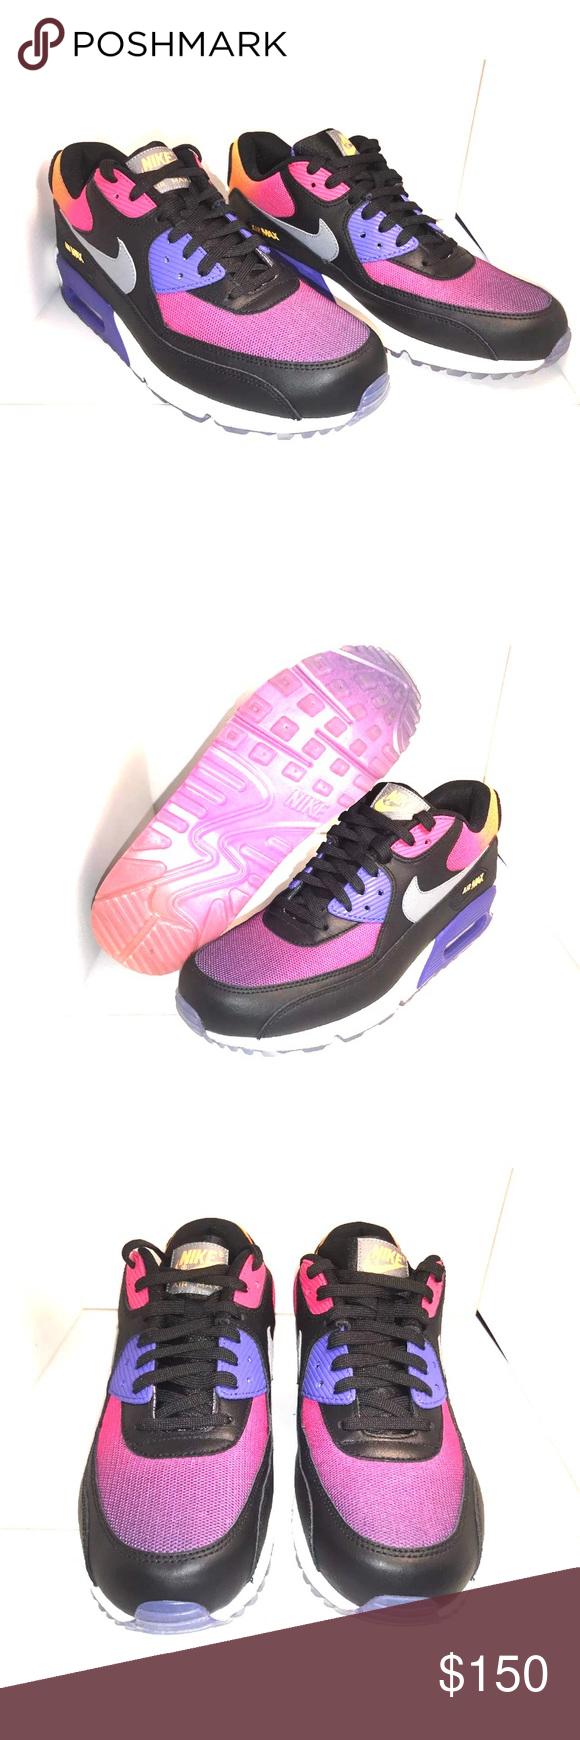 meet 857d1 fcfdd NIKE AIR MAX 90 SD SUNSET BLACKCOOL GREY-VOLT 🔥 New no box Nike Shoes  Sneakers